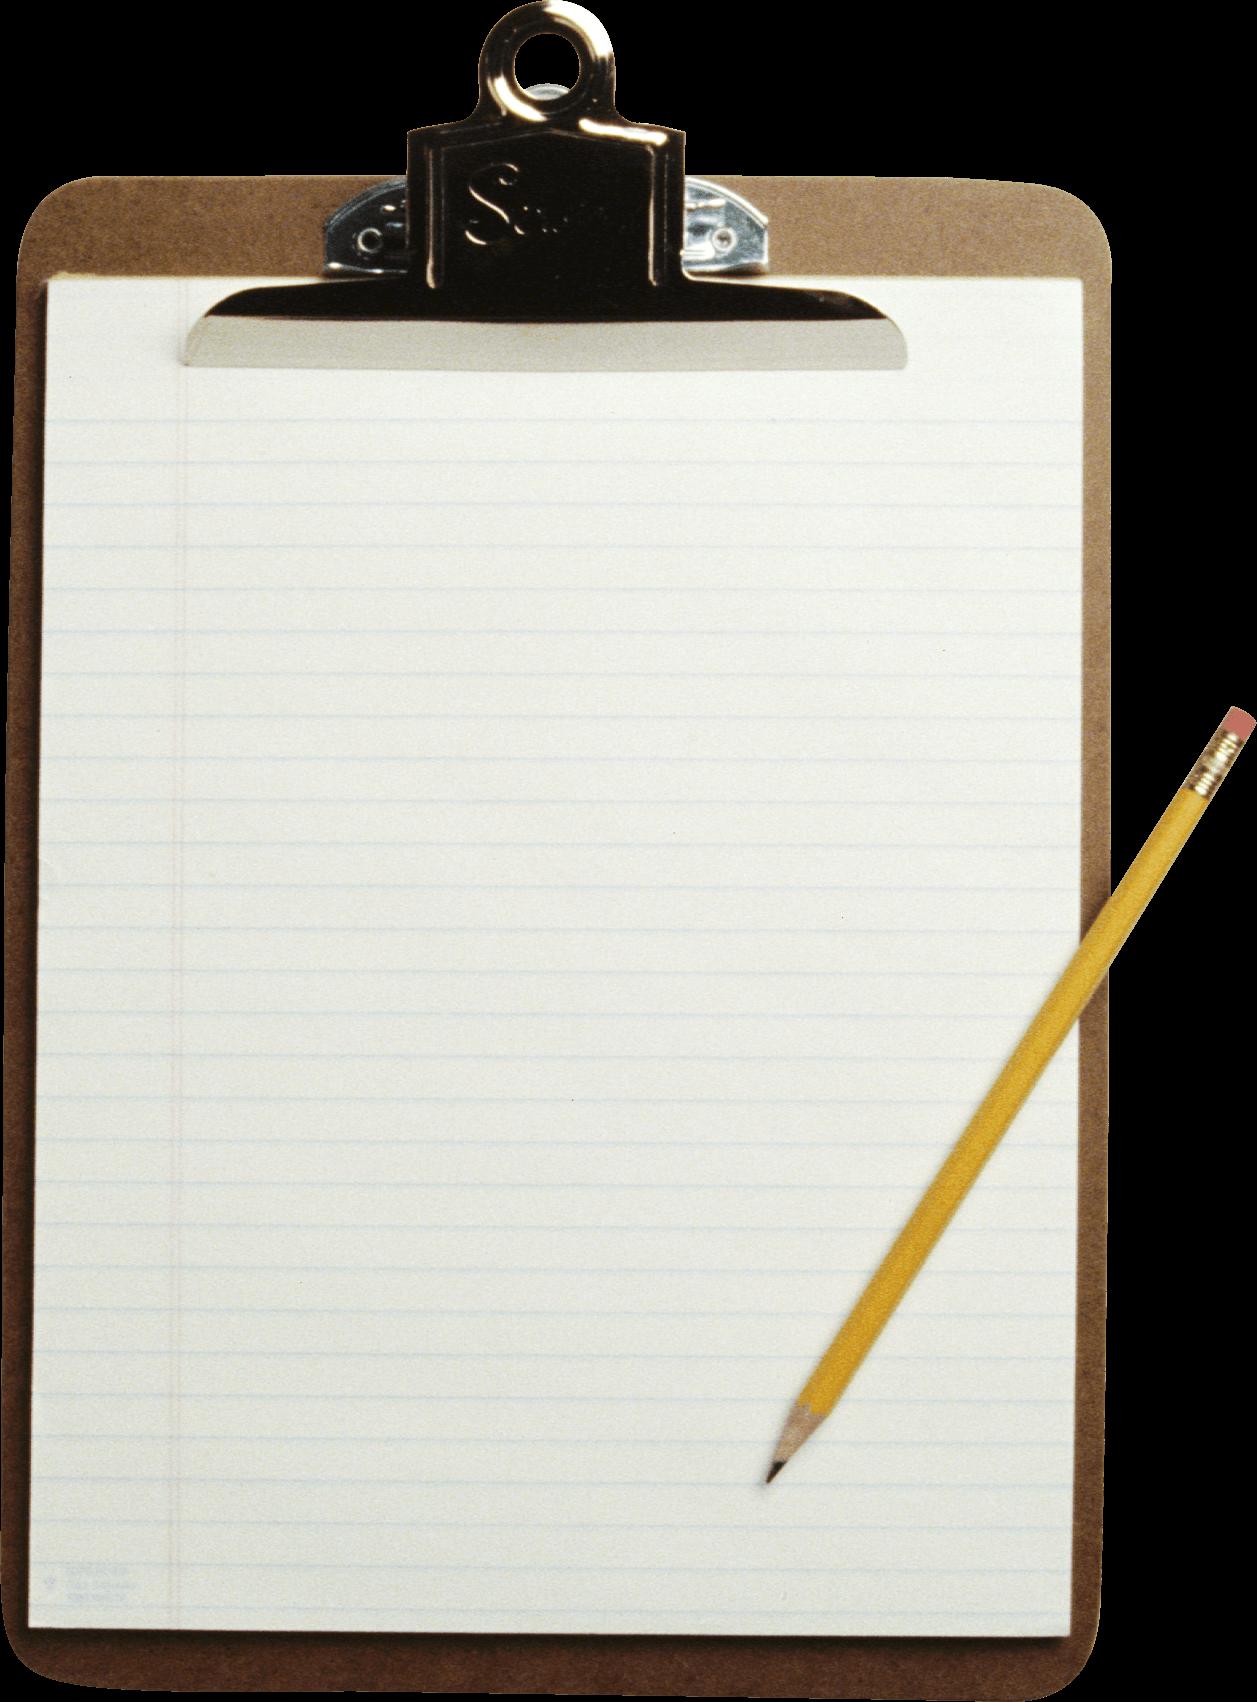 Transparent clipboard clipart - Paper Clipart Clipboard - Sheet Of Paper Png